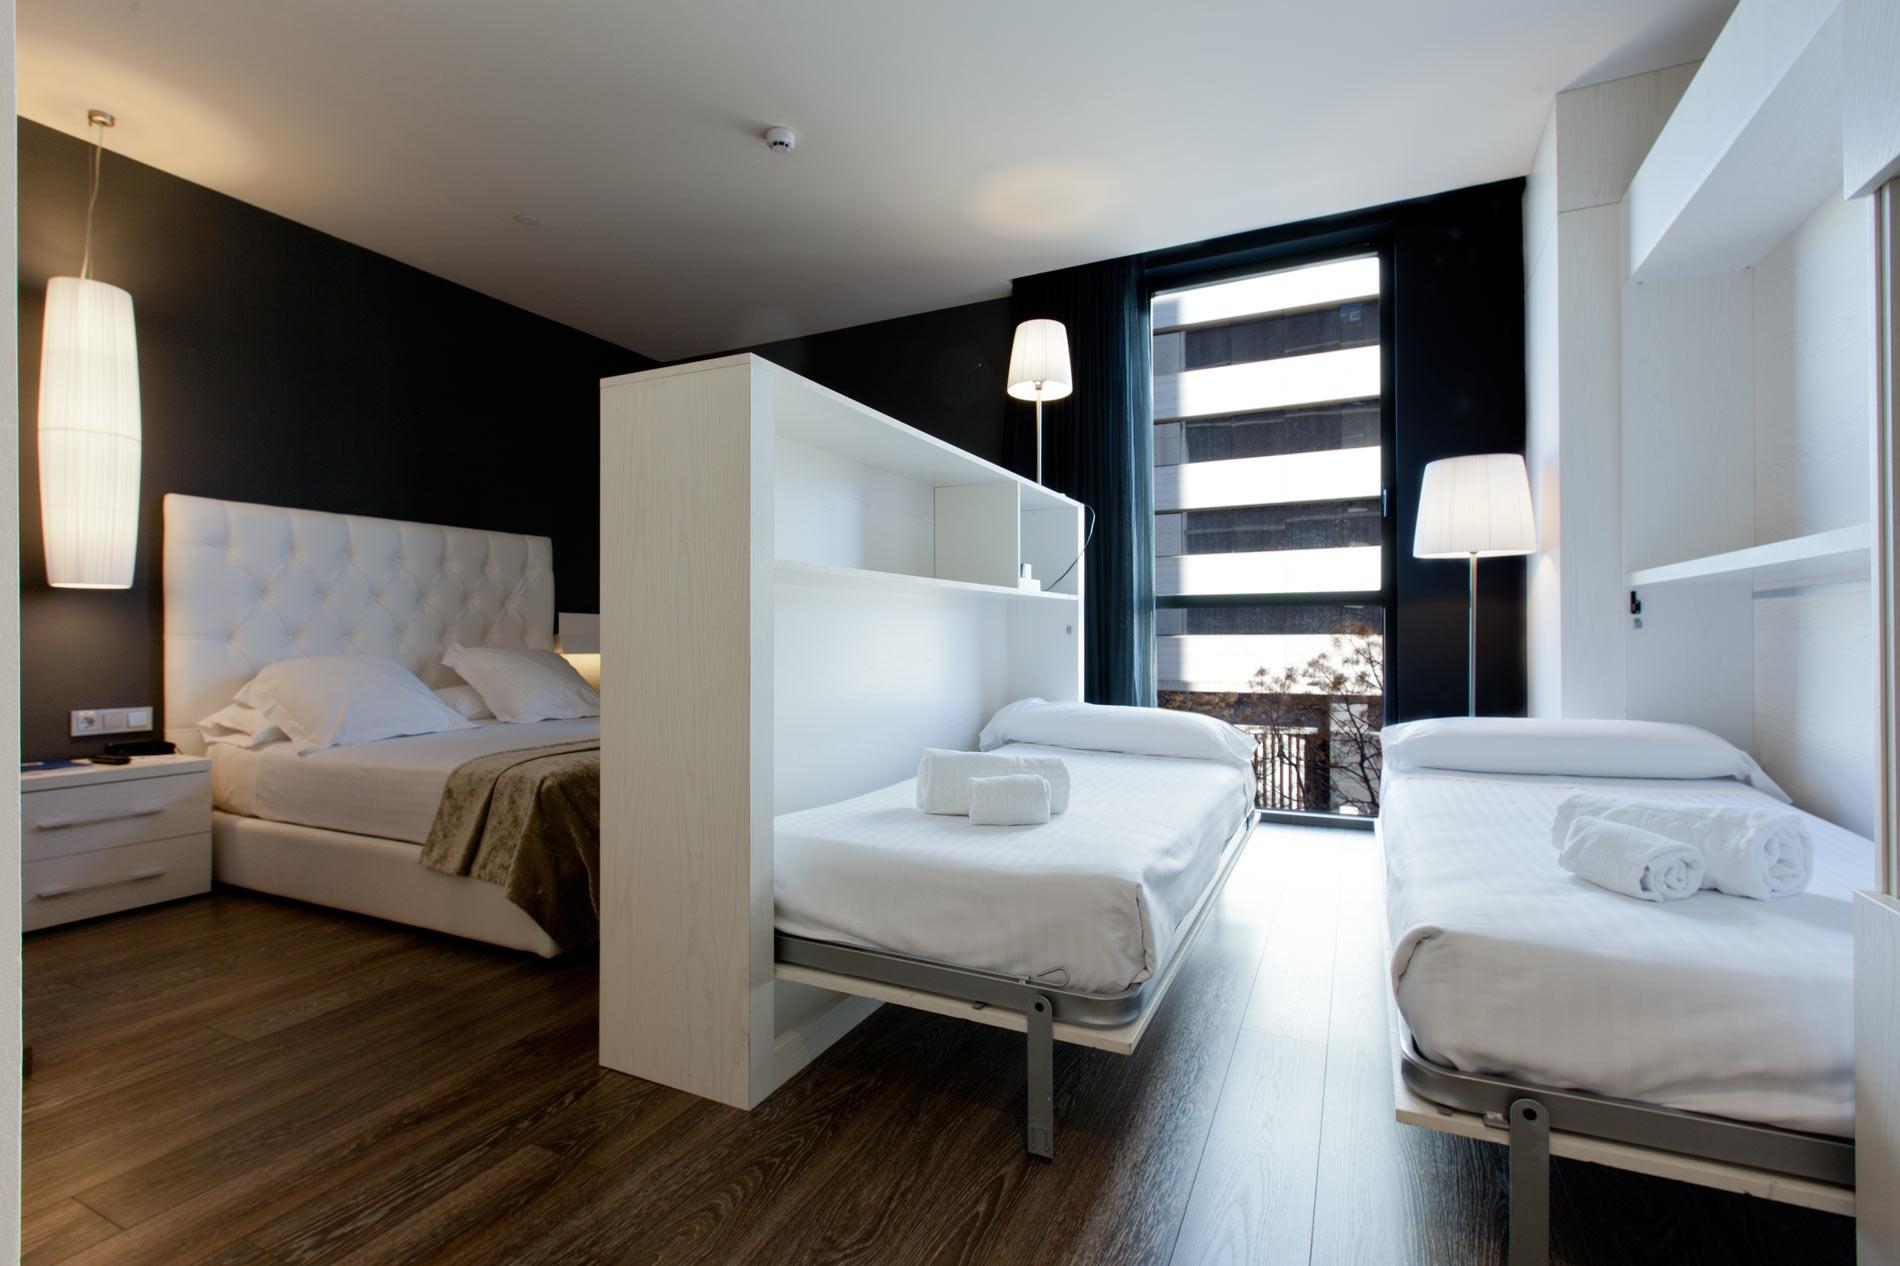 Vacanze con i bambini for Hotel habitacion familiar londres